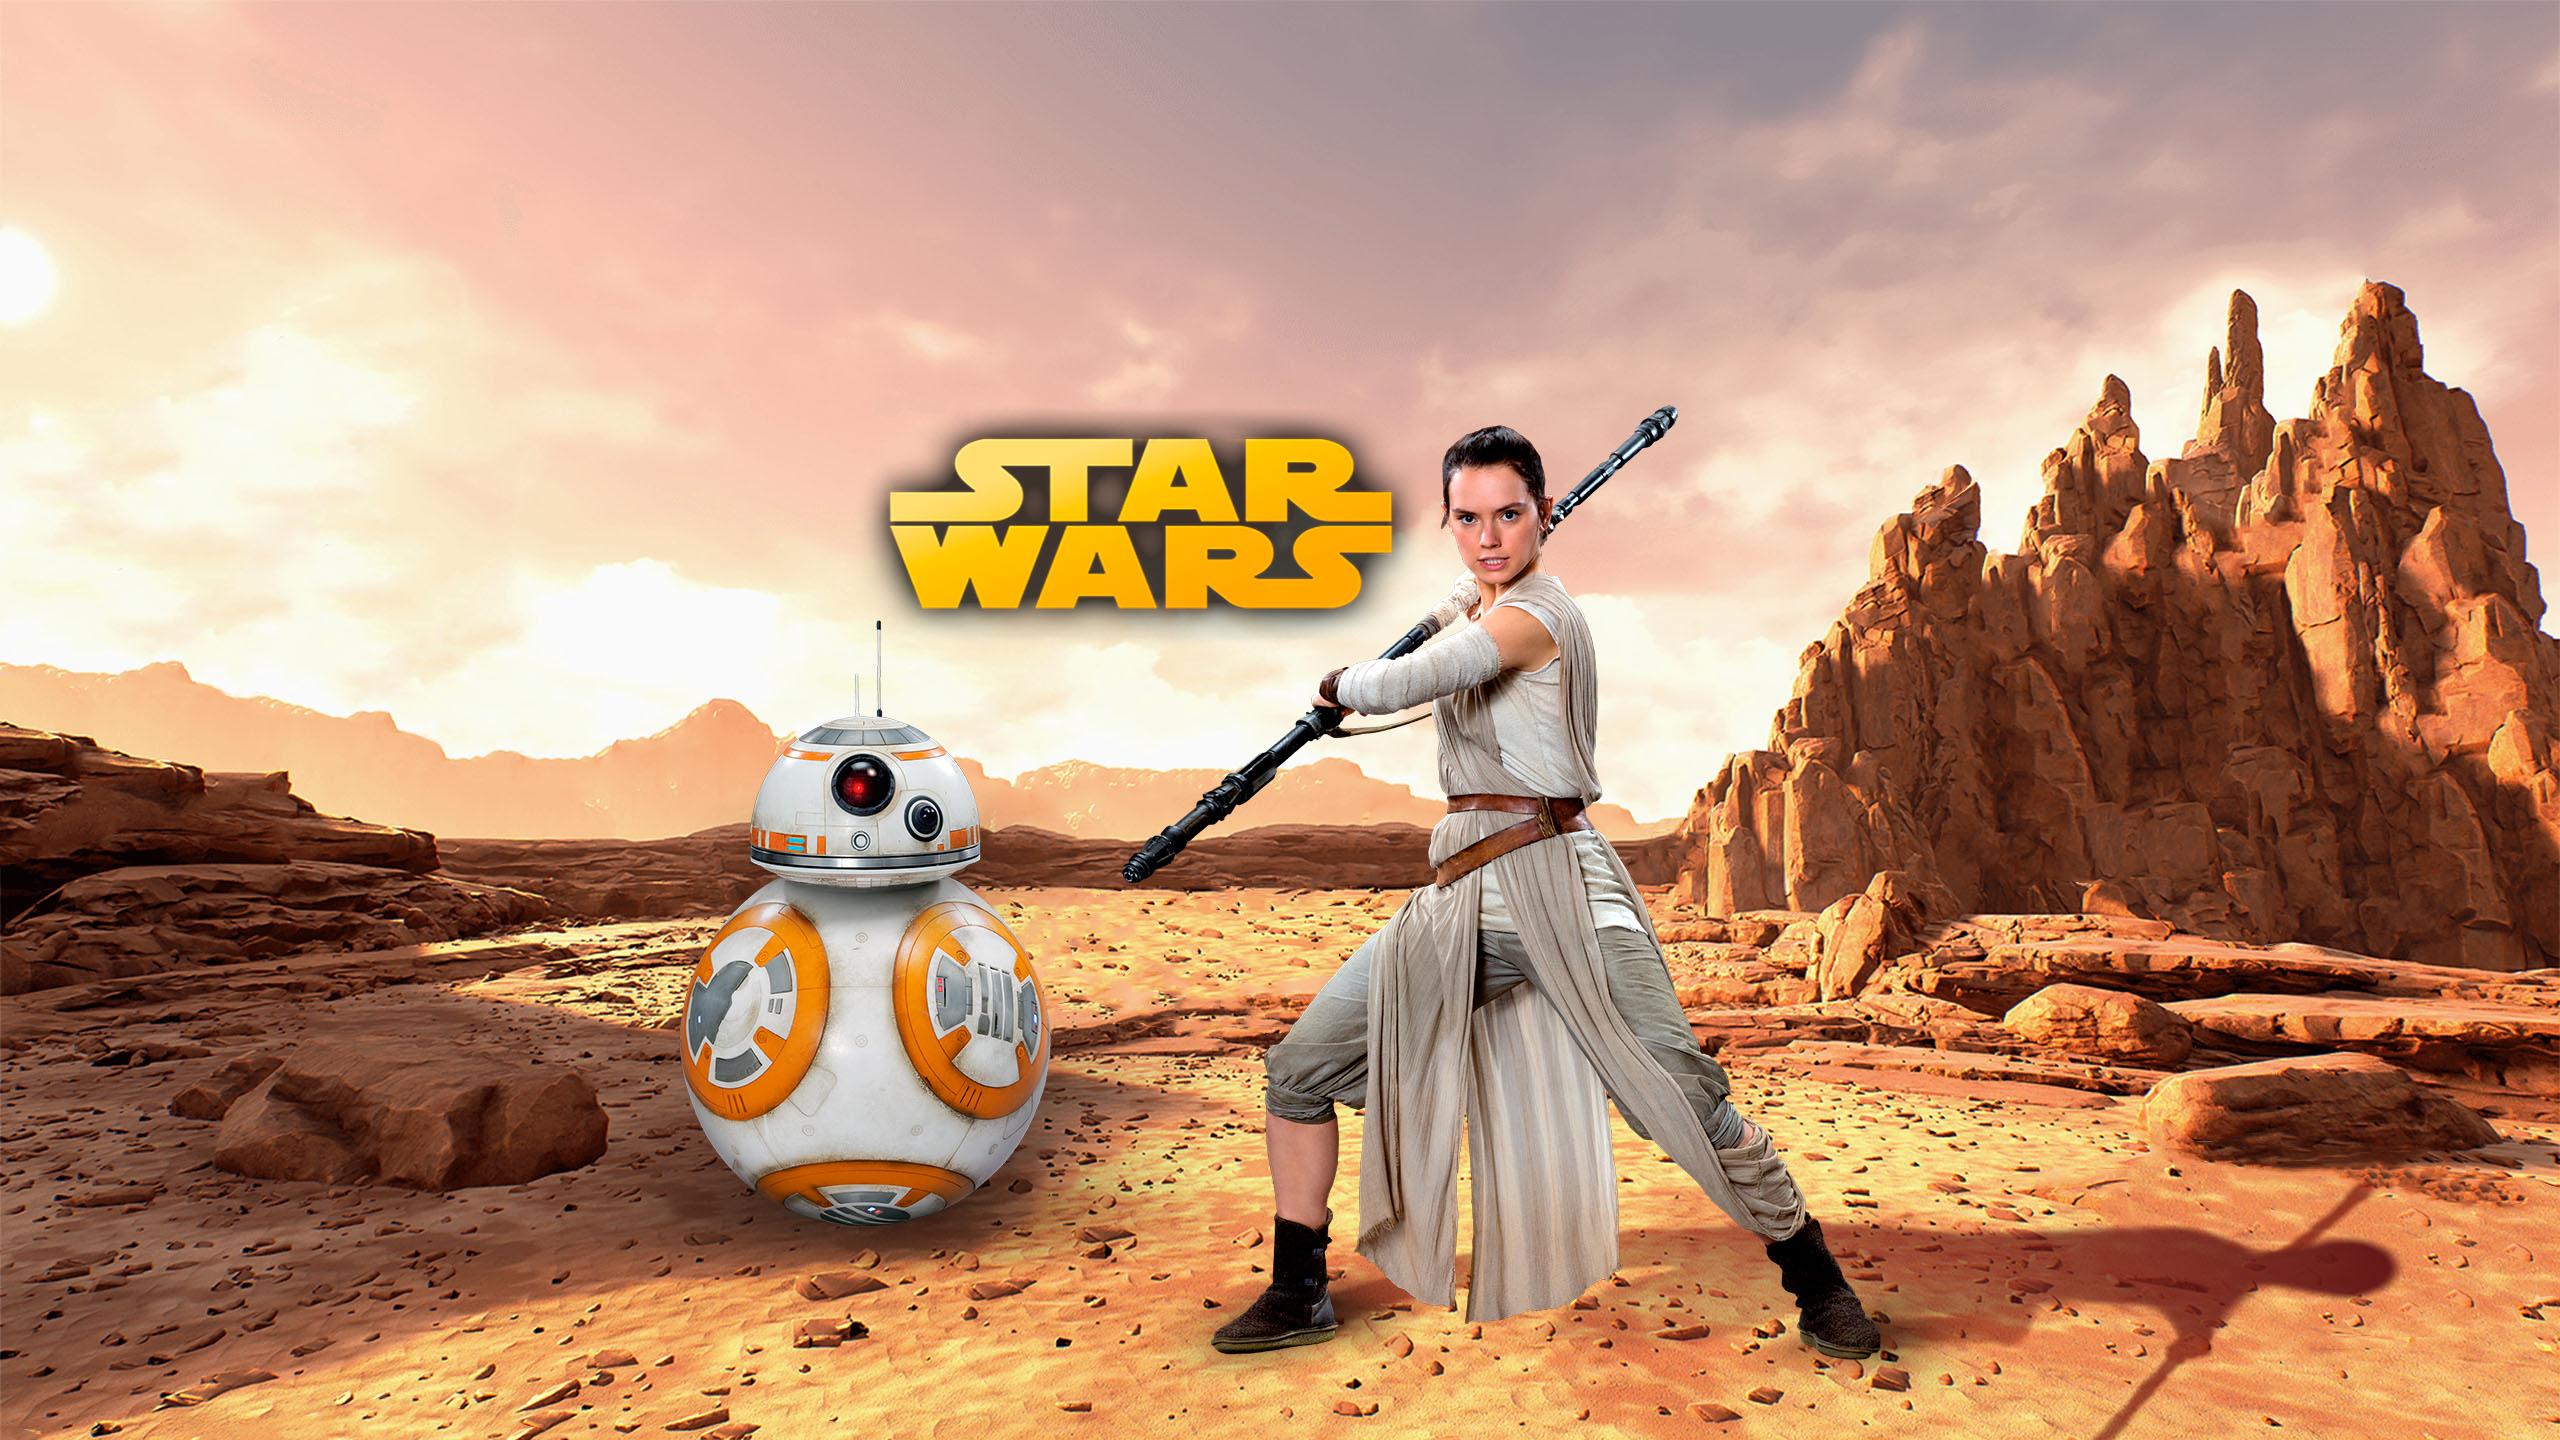 Star Wars Rey Wallpaper By Walentywalewski On Deviantart